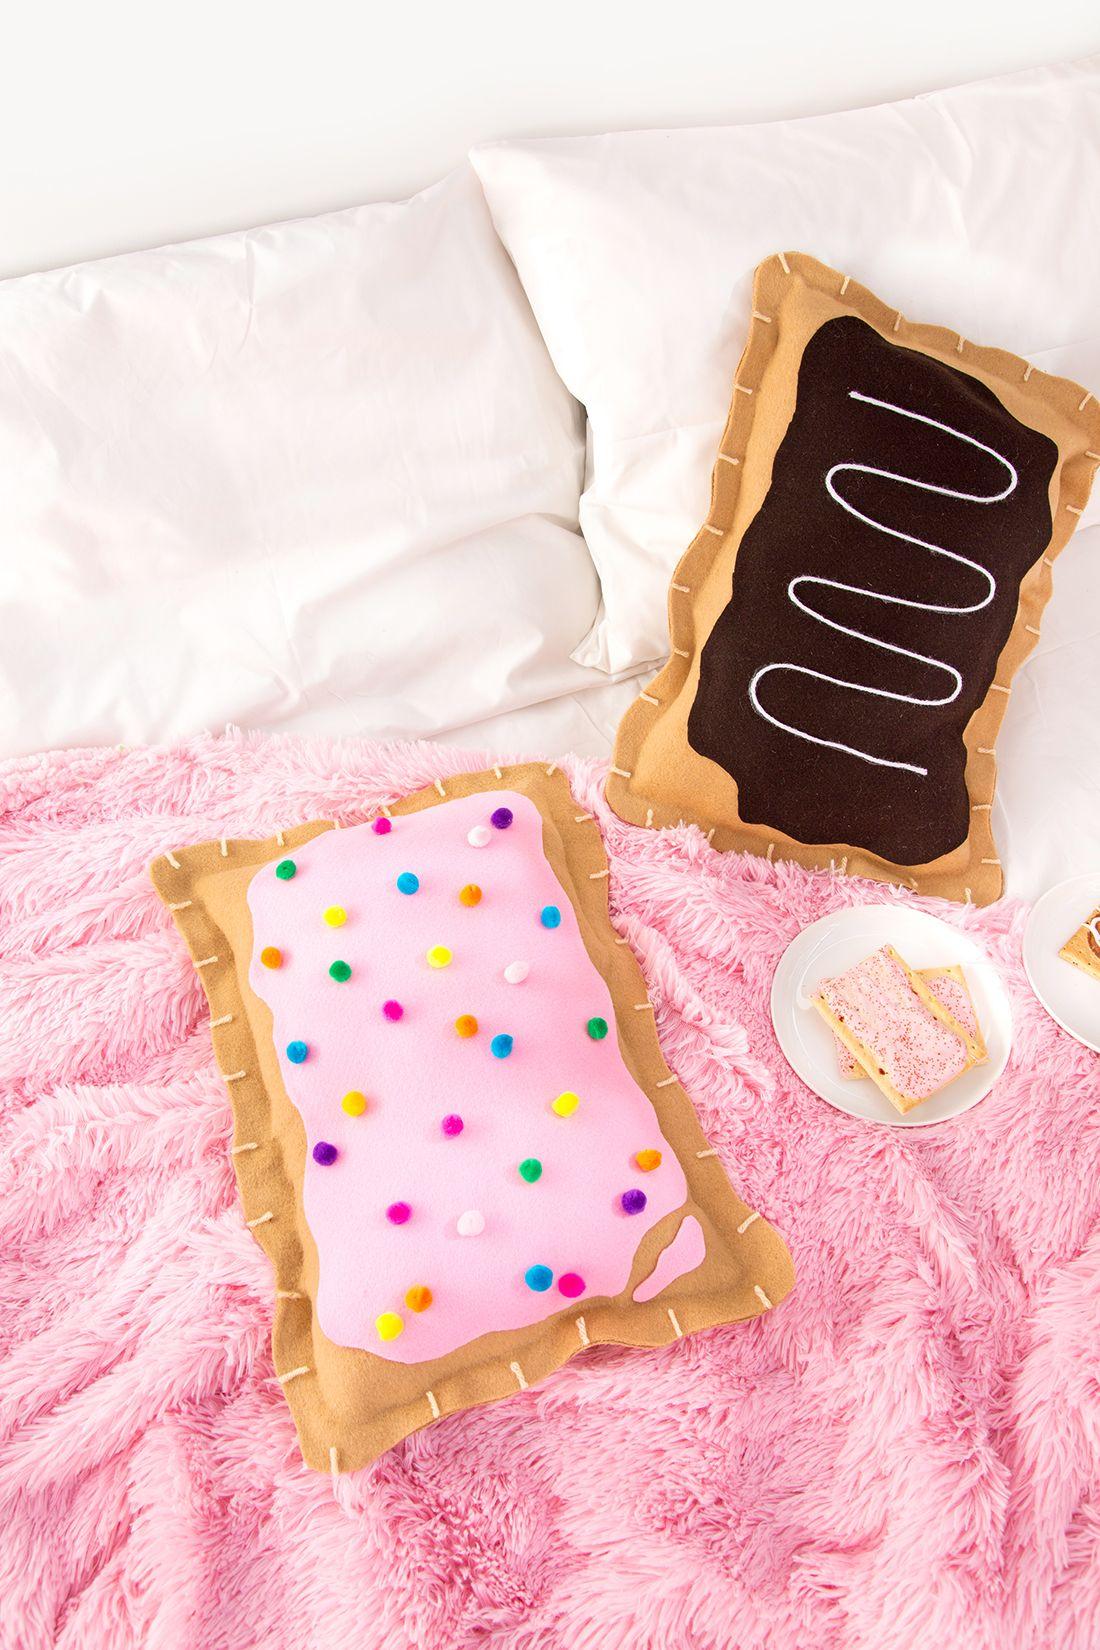 diy no sew pop tart pillow aww sam tarts pillows and christmas gifts. Black Bedroom Furniture Sets. Home Design Ideas